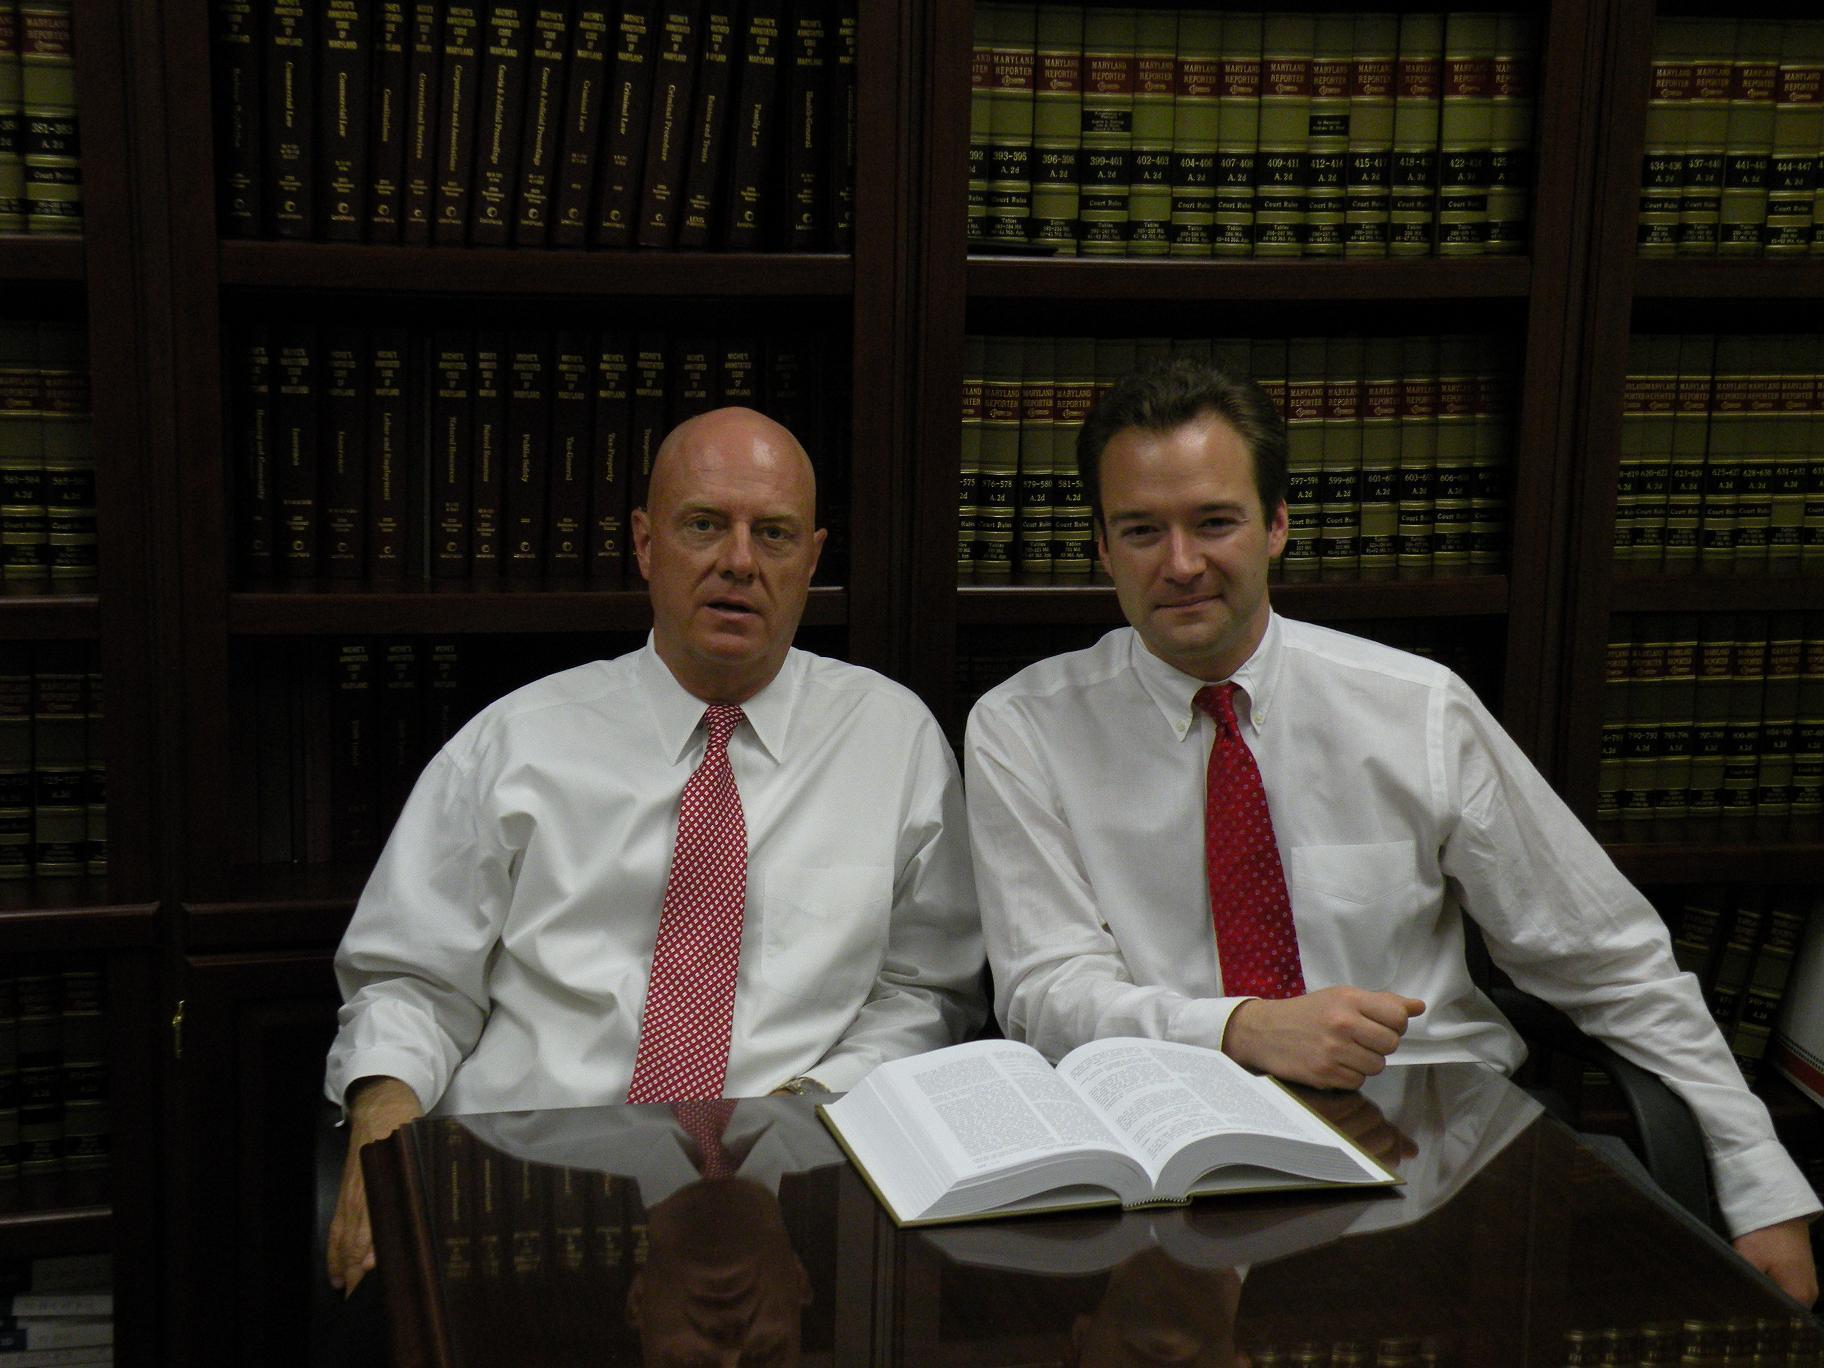 Murphy & Price, LLP